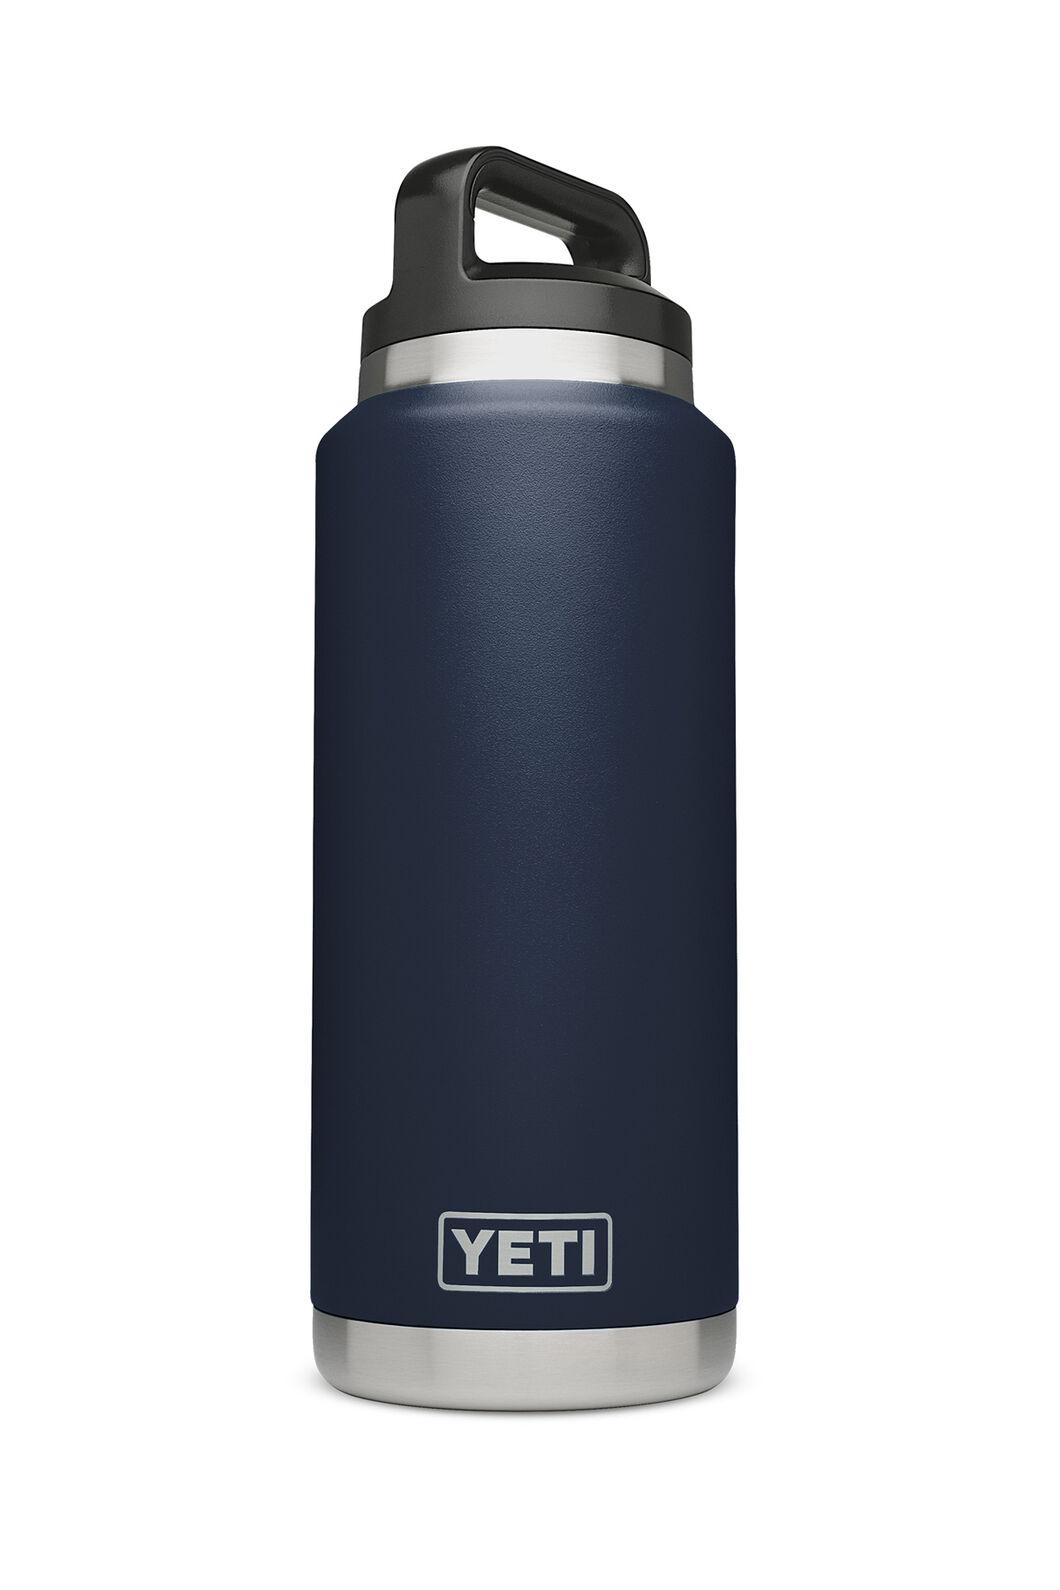 Yeti Rambler Drink Bottle Stainless Steel 36oz, Navy, hi-res